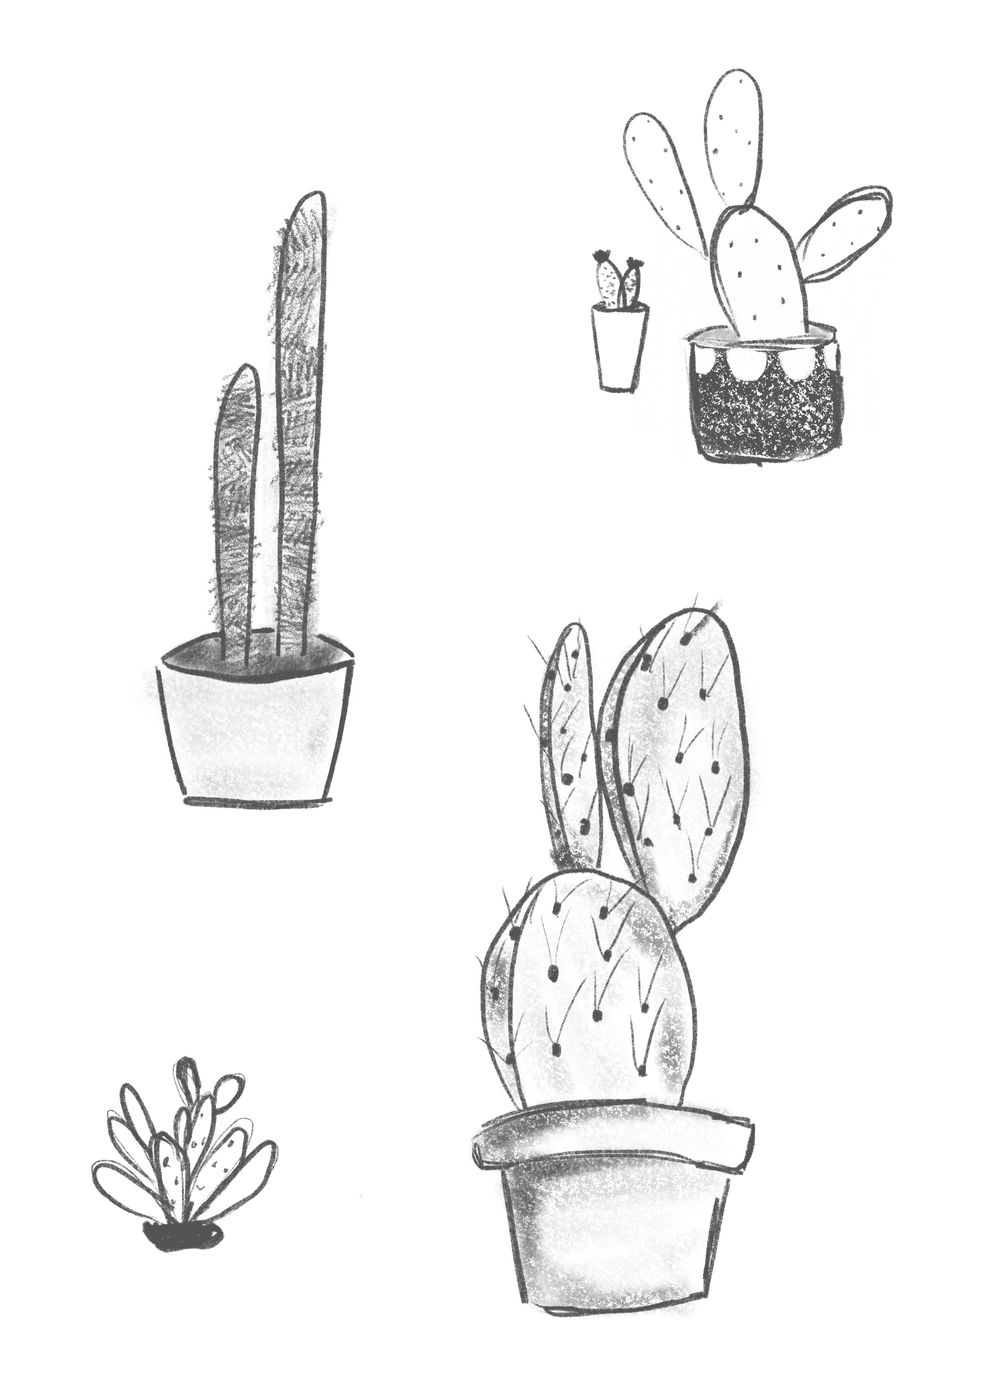 Sketchbooky - image 1 - student project